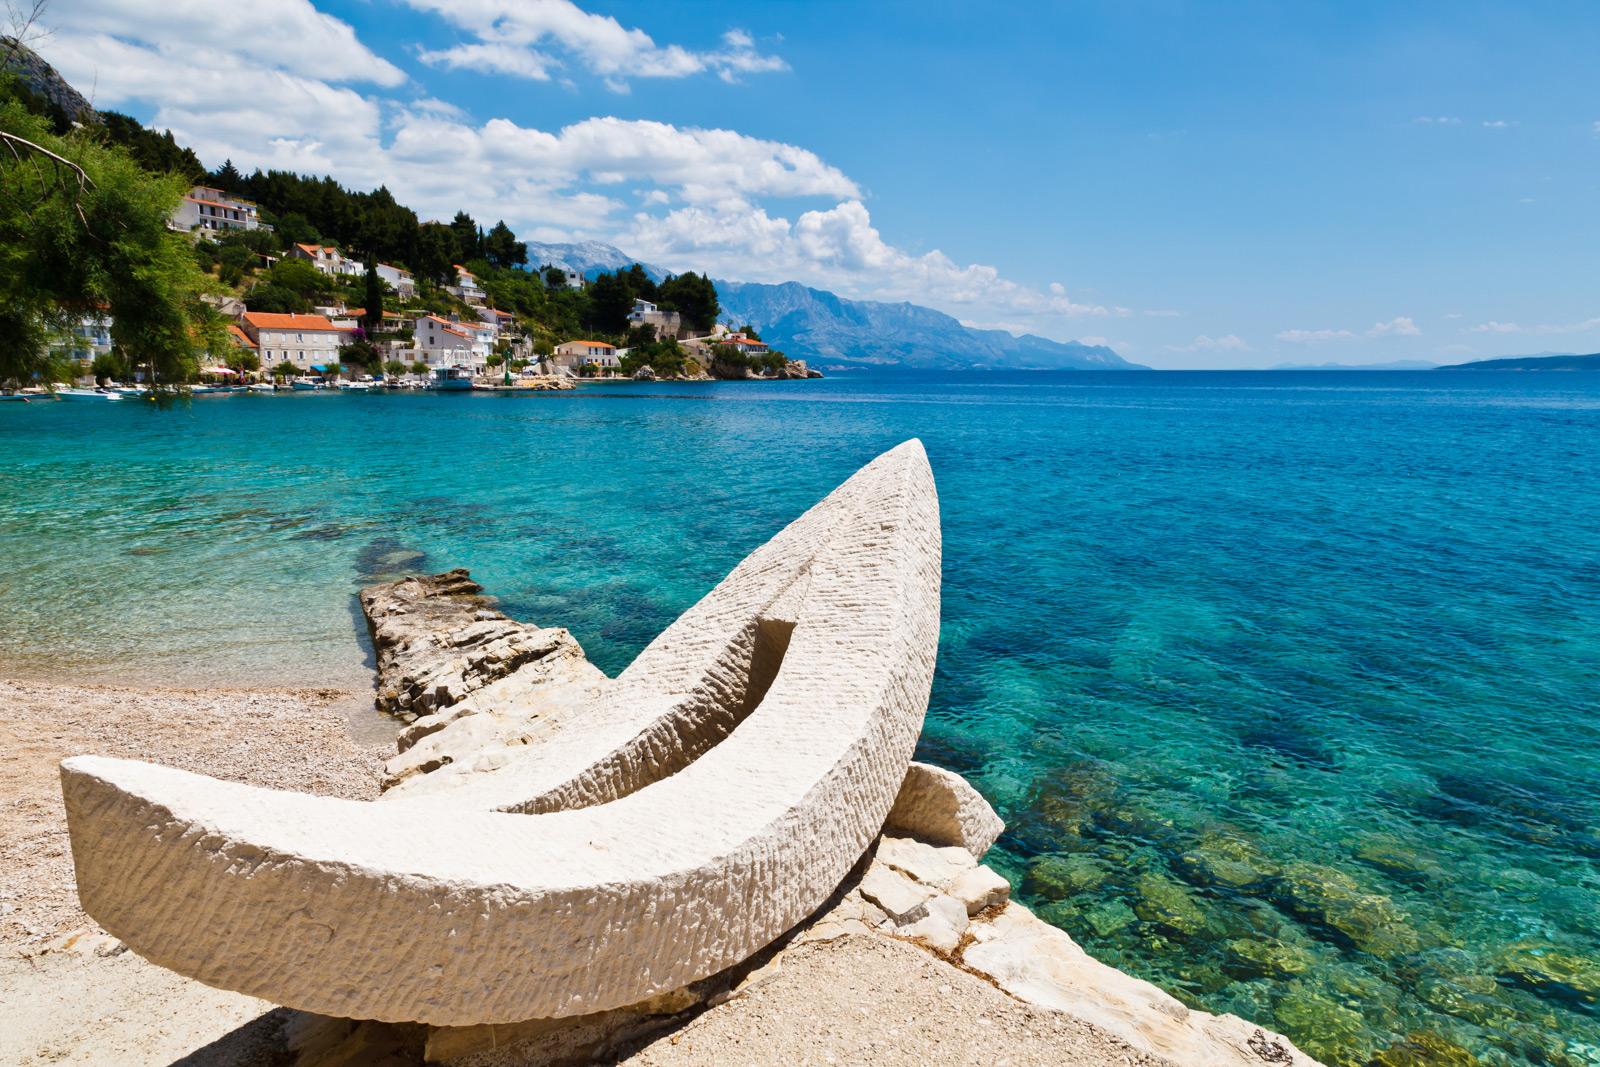 Adriatic Sea Charter Croatia Azure